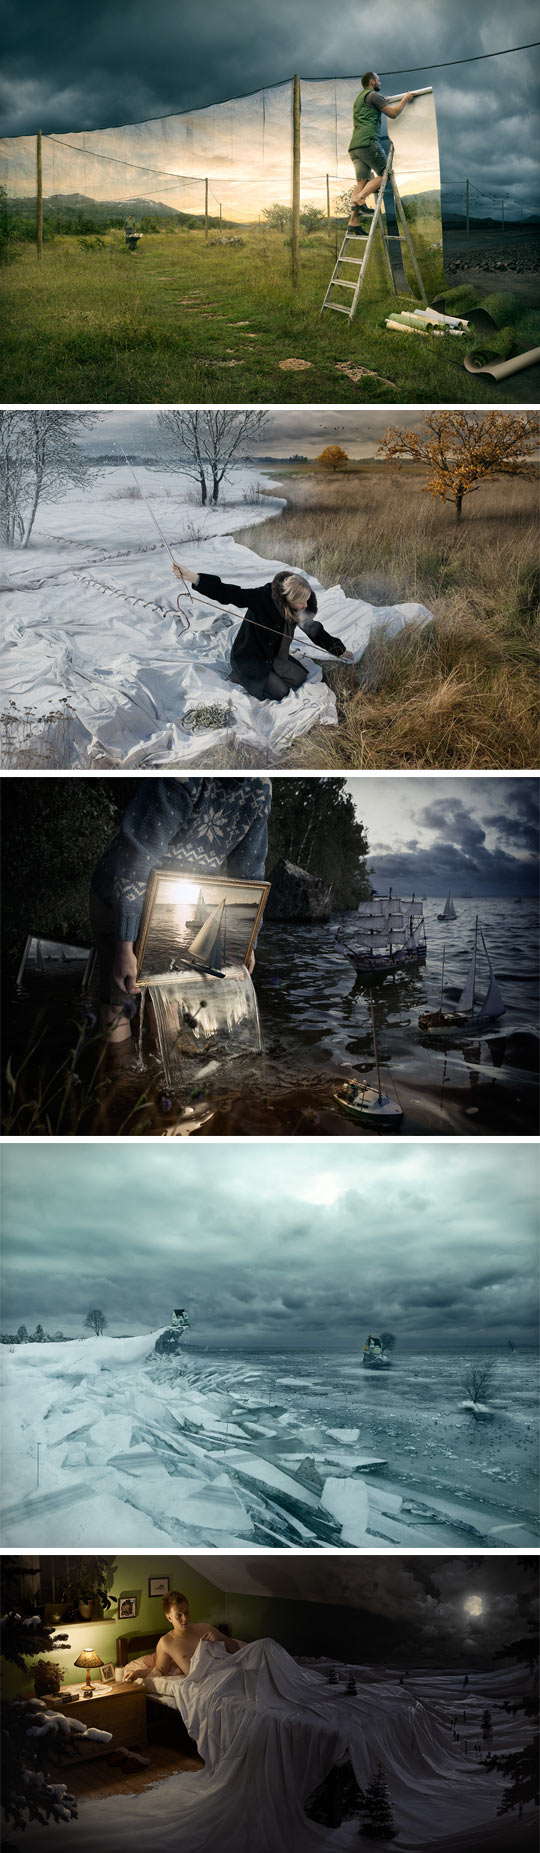 Surreal Photos